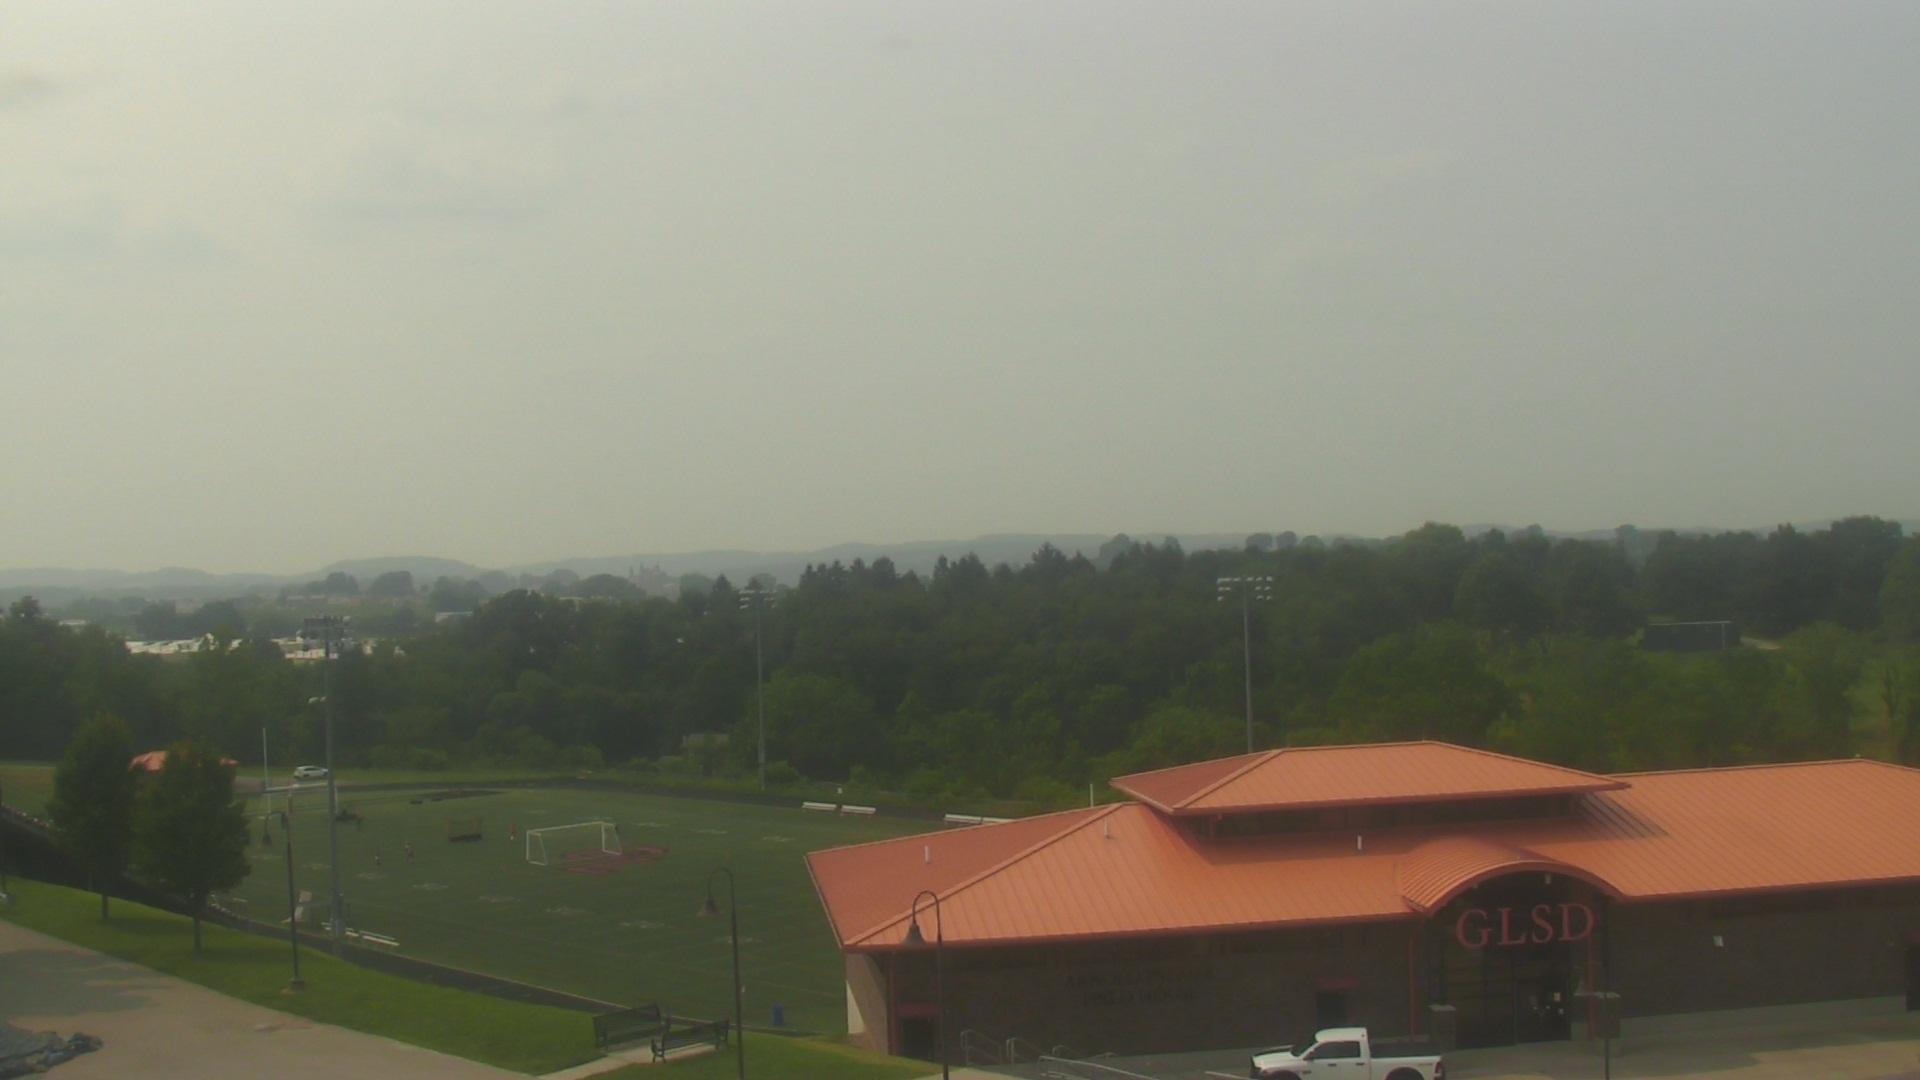 Live Camera from Greater Latrobe Jr/Sr HS, Latrobe, PA 15650